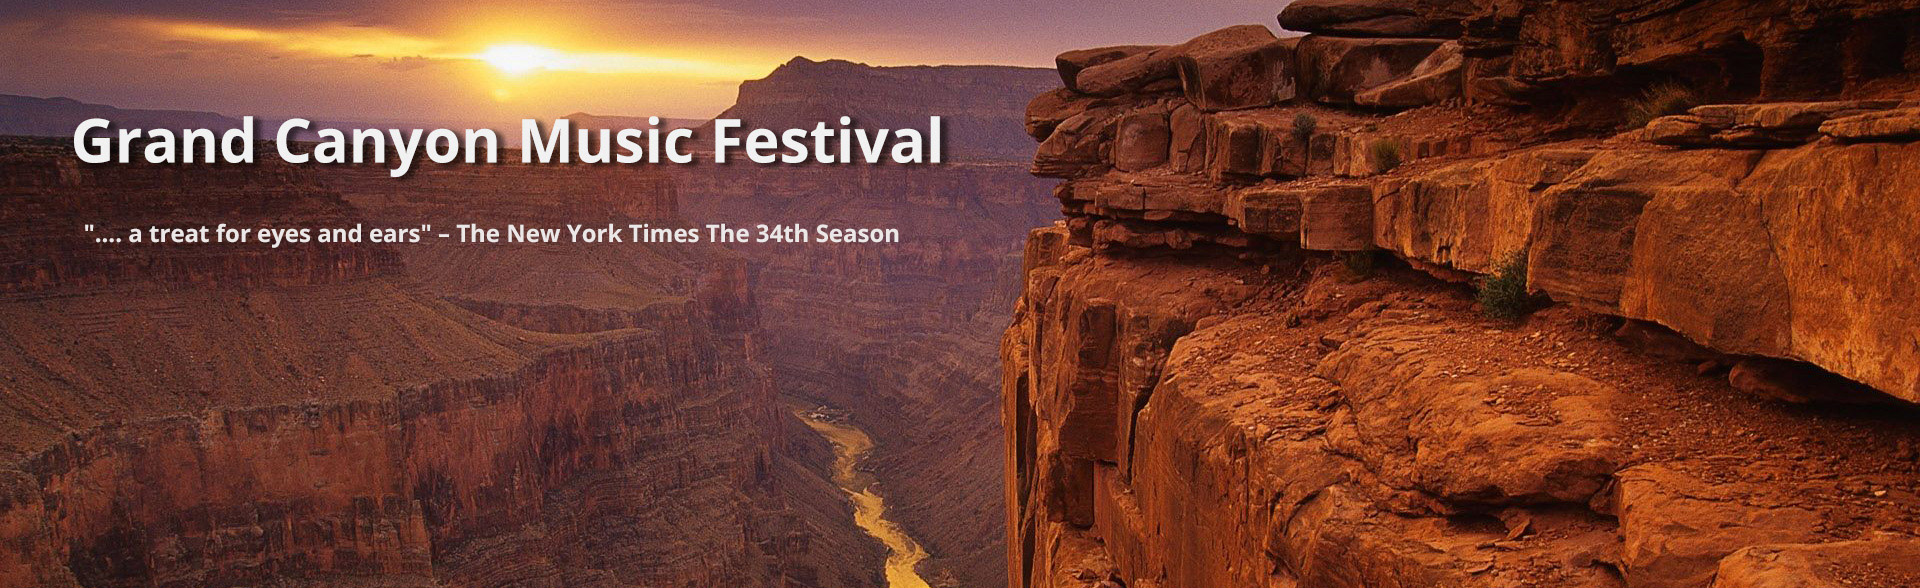 Grand Canyon Music Festival